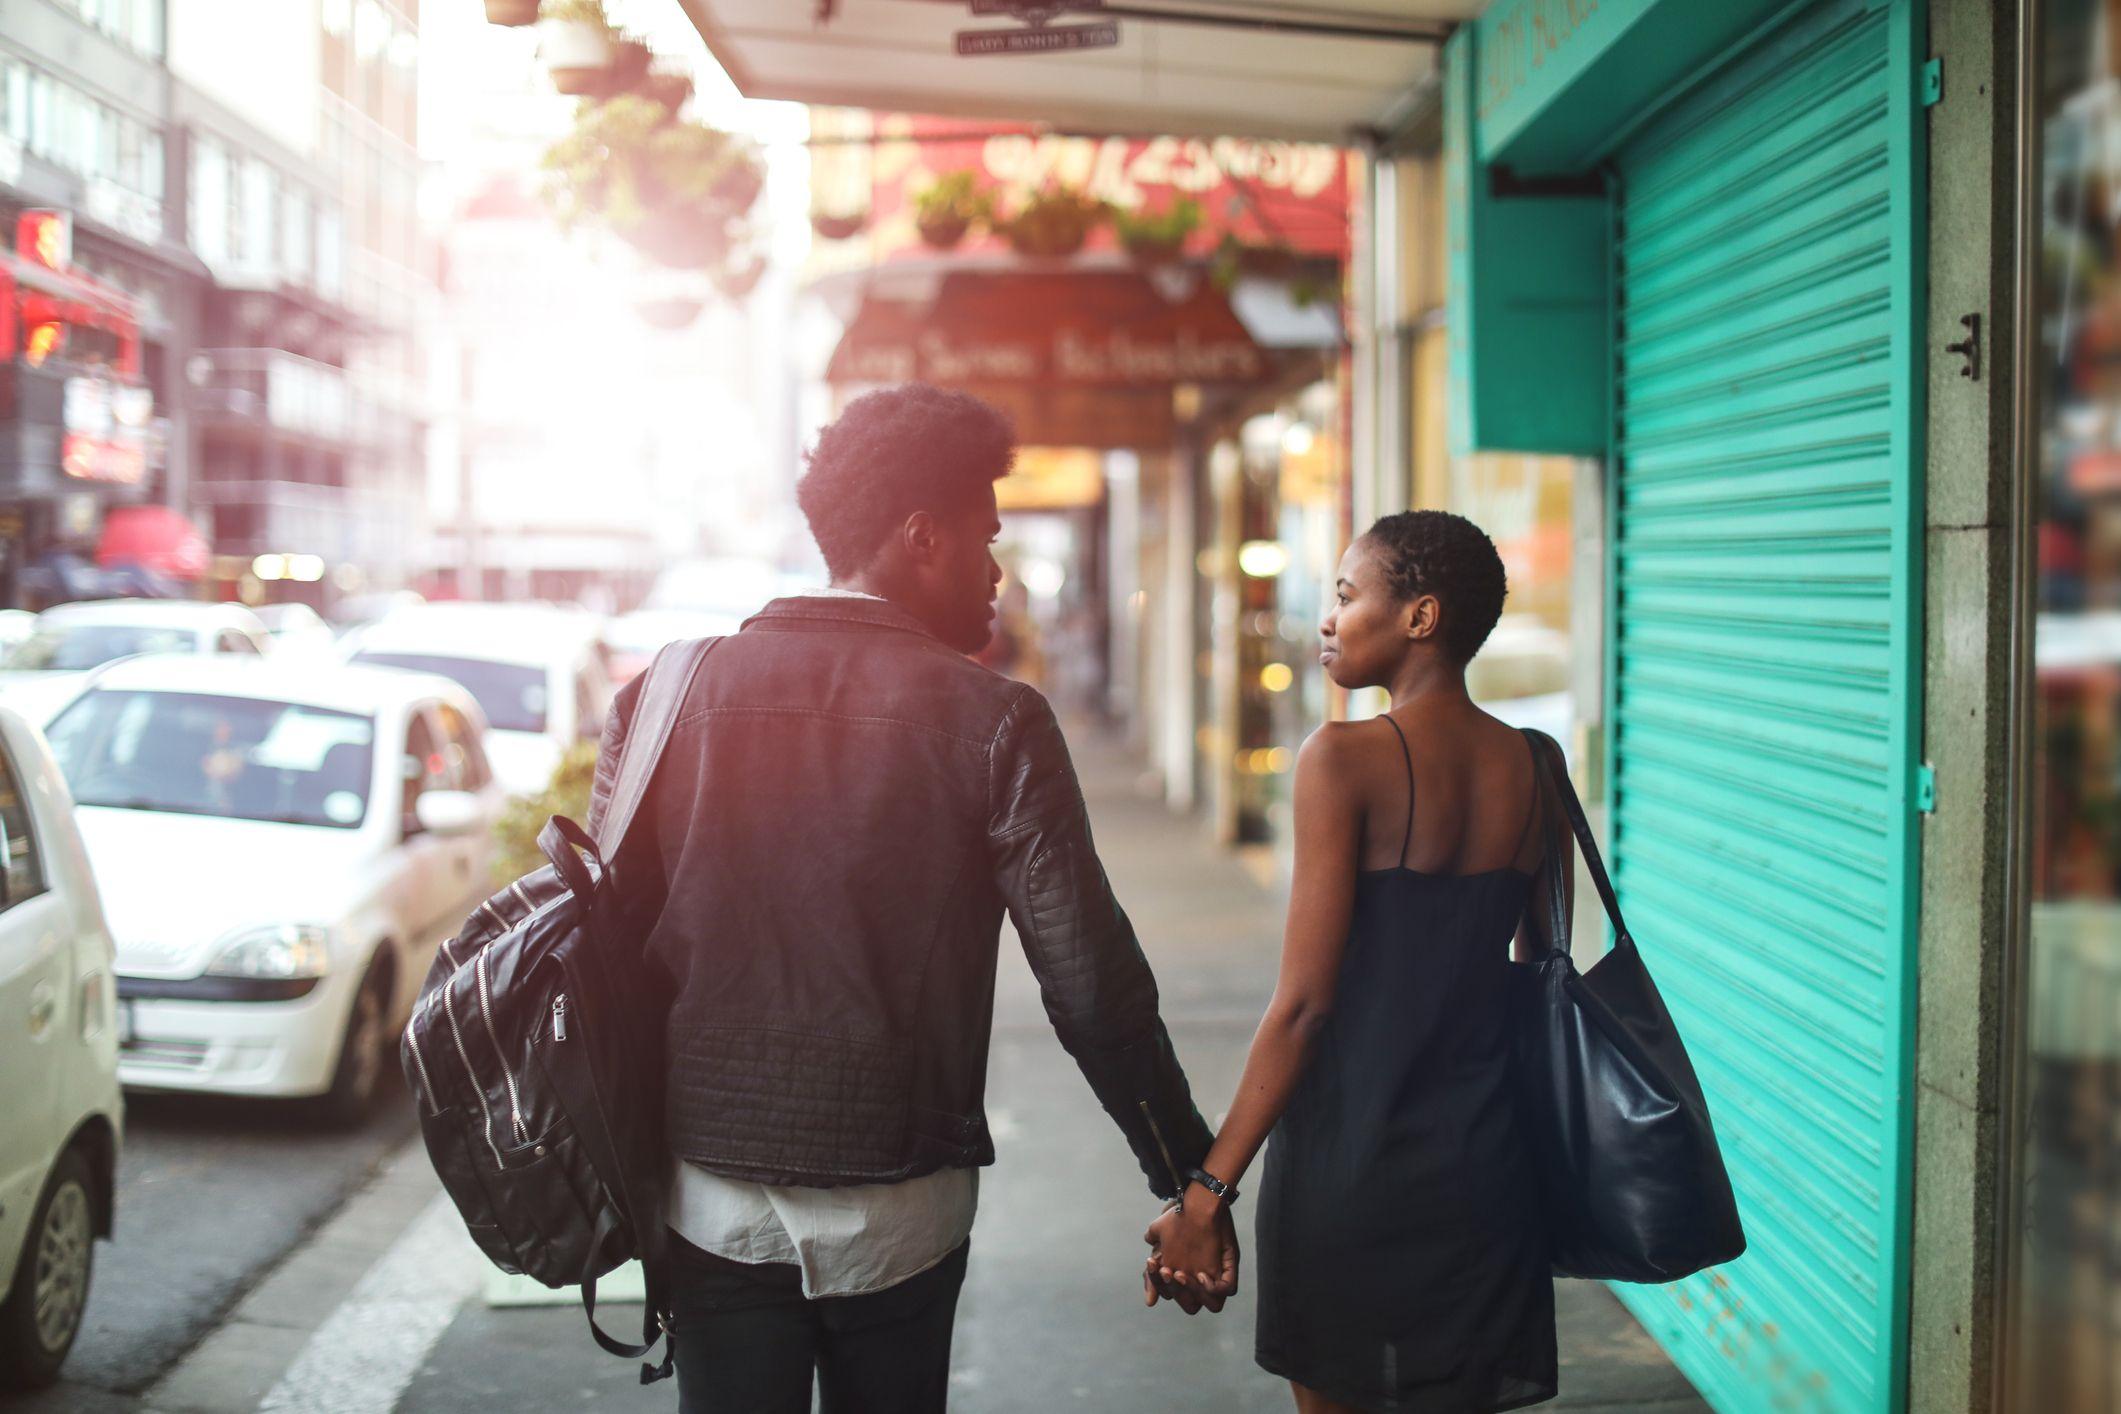 Taglines for online dating